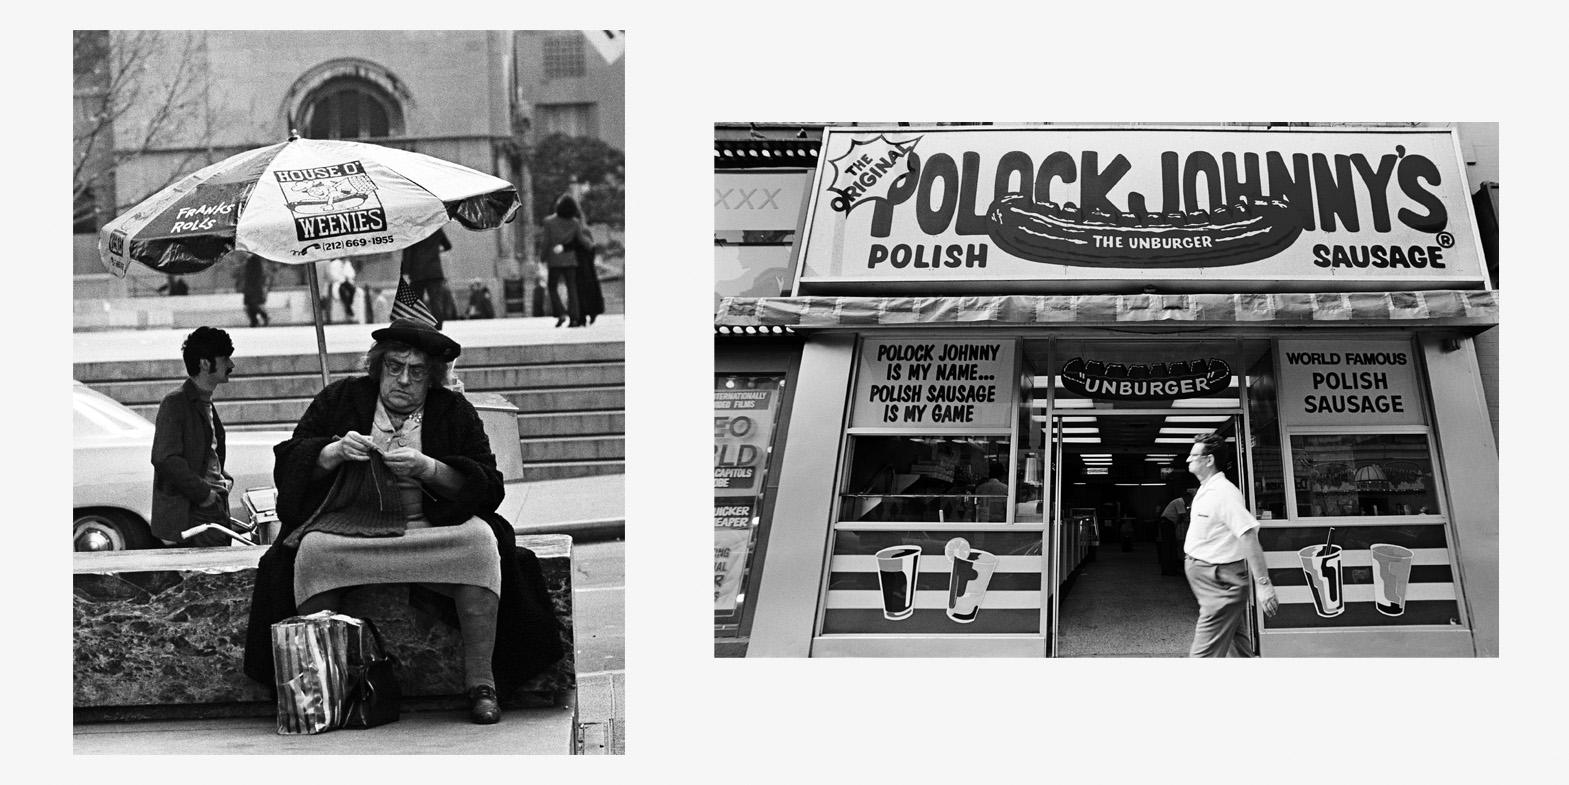 PP128-129_House_of_Weenies_New_York_1980-Polock_Johnny's_Maryland_1981.jpg